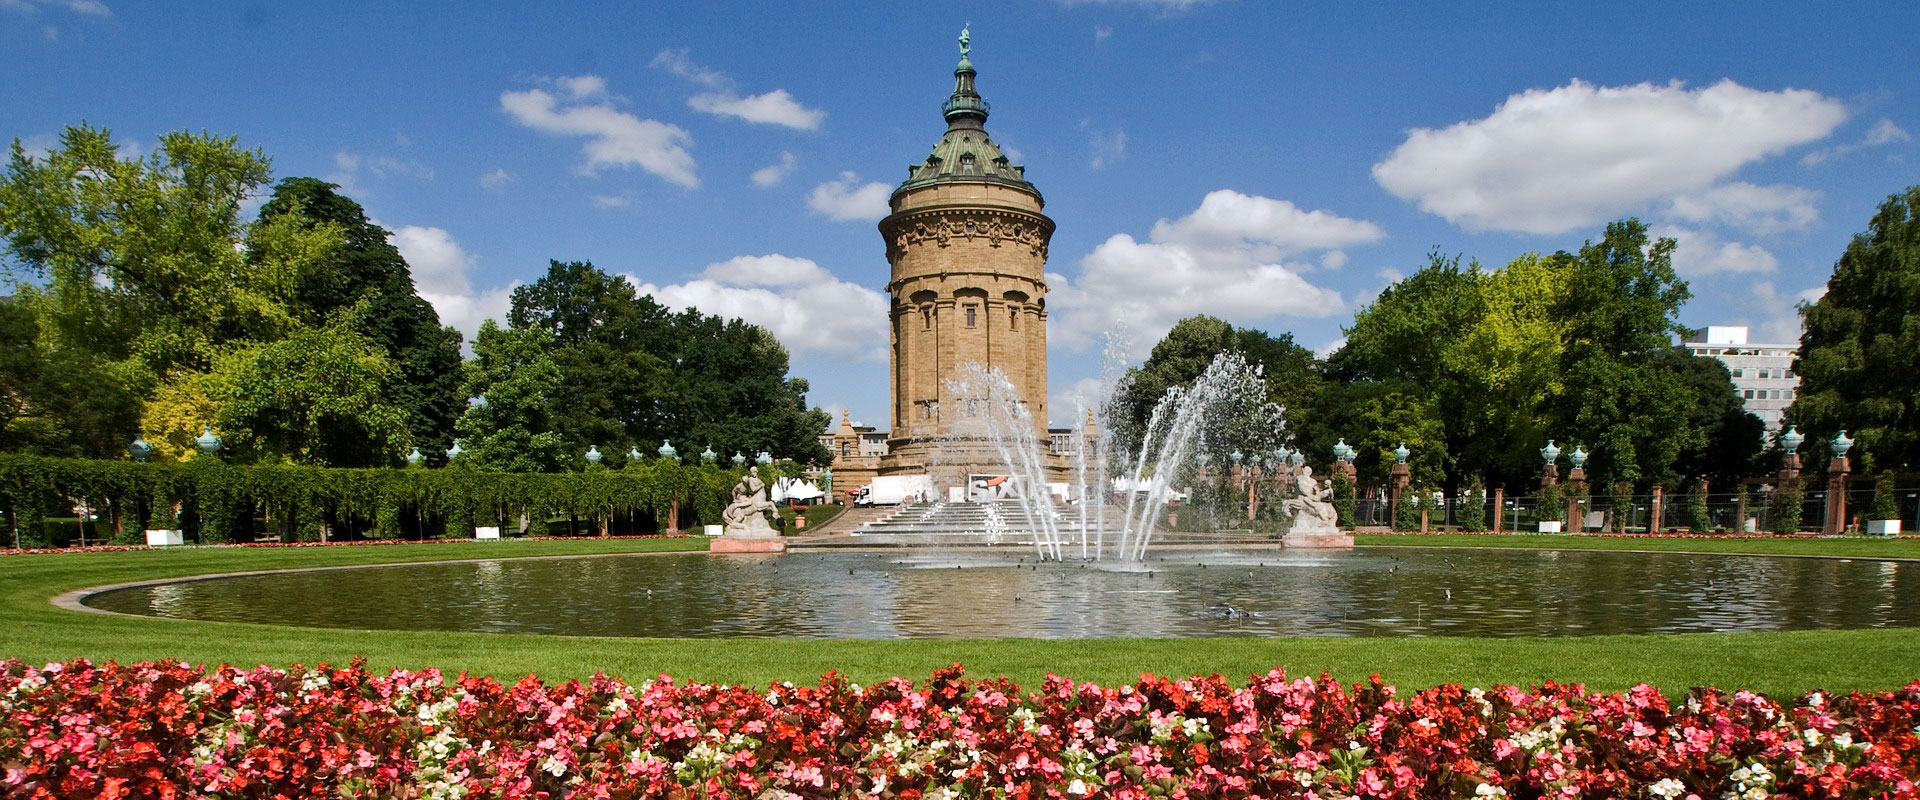 Mannheim - Wasserturm